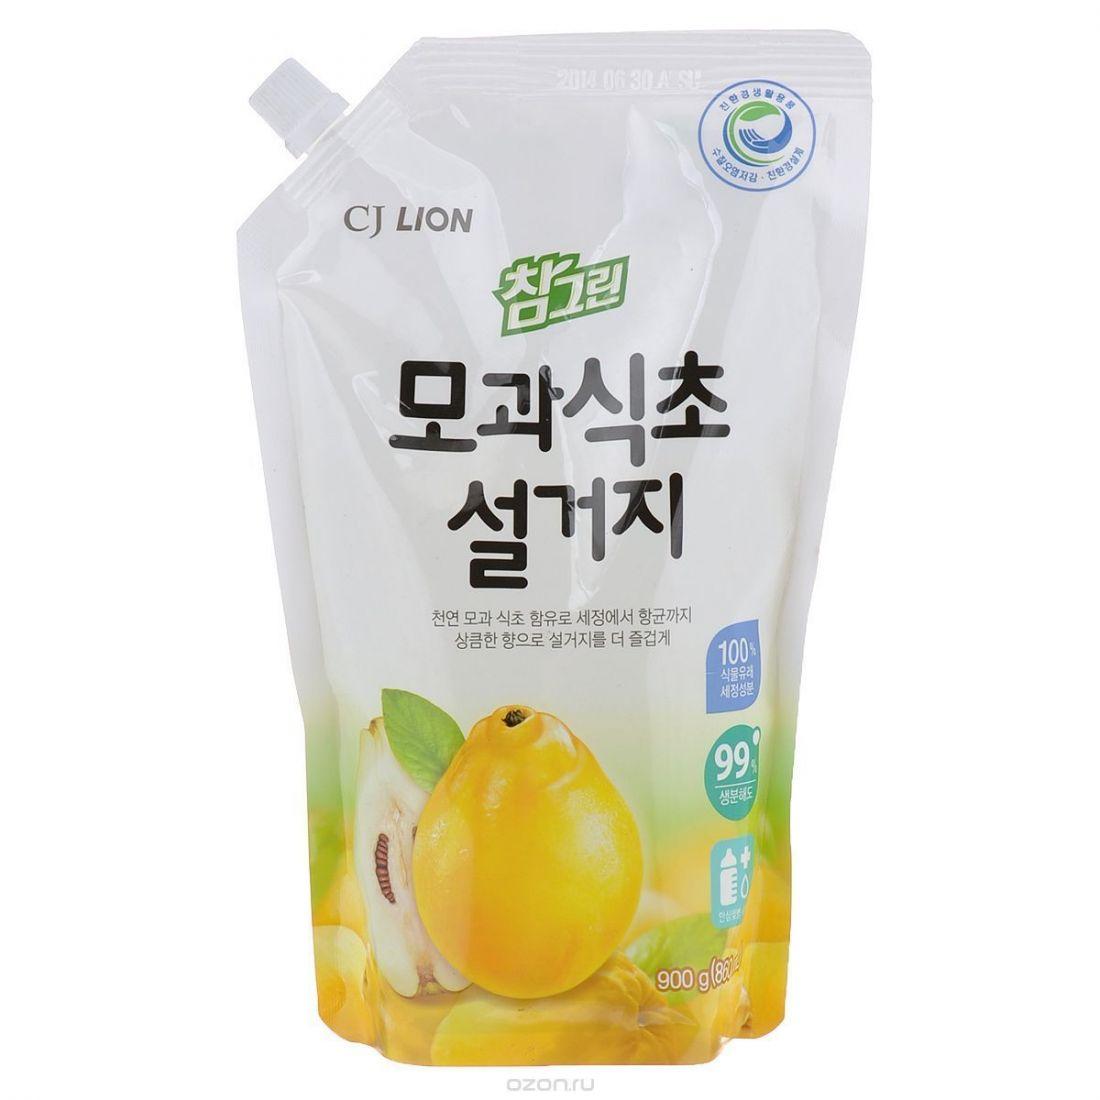 CJ Lion Средство для мытья посуды Chamgreen С айвой, мягкая упаковка, 860 мл